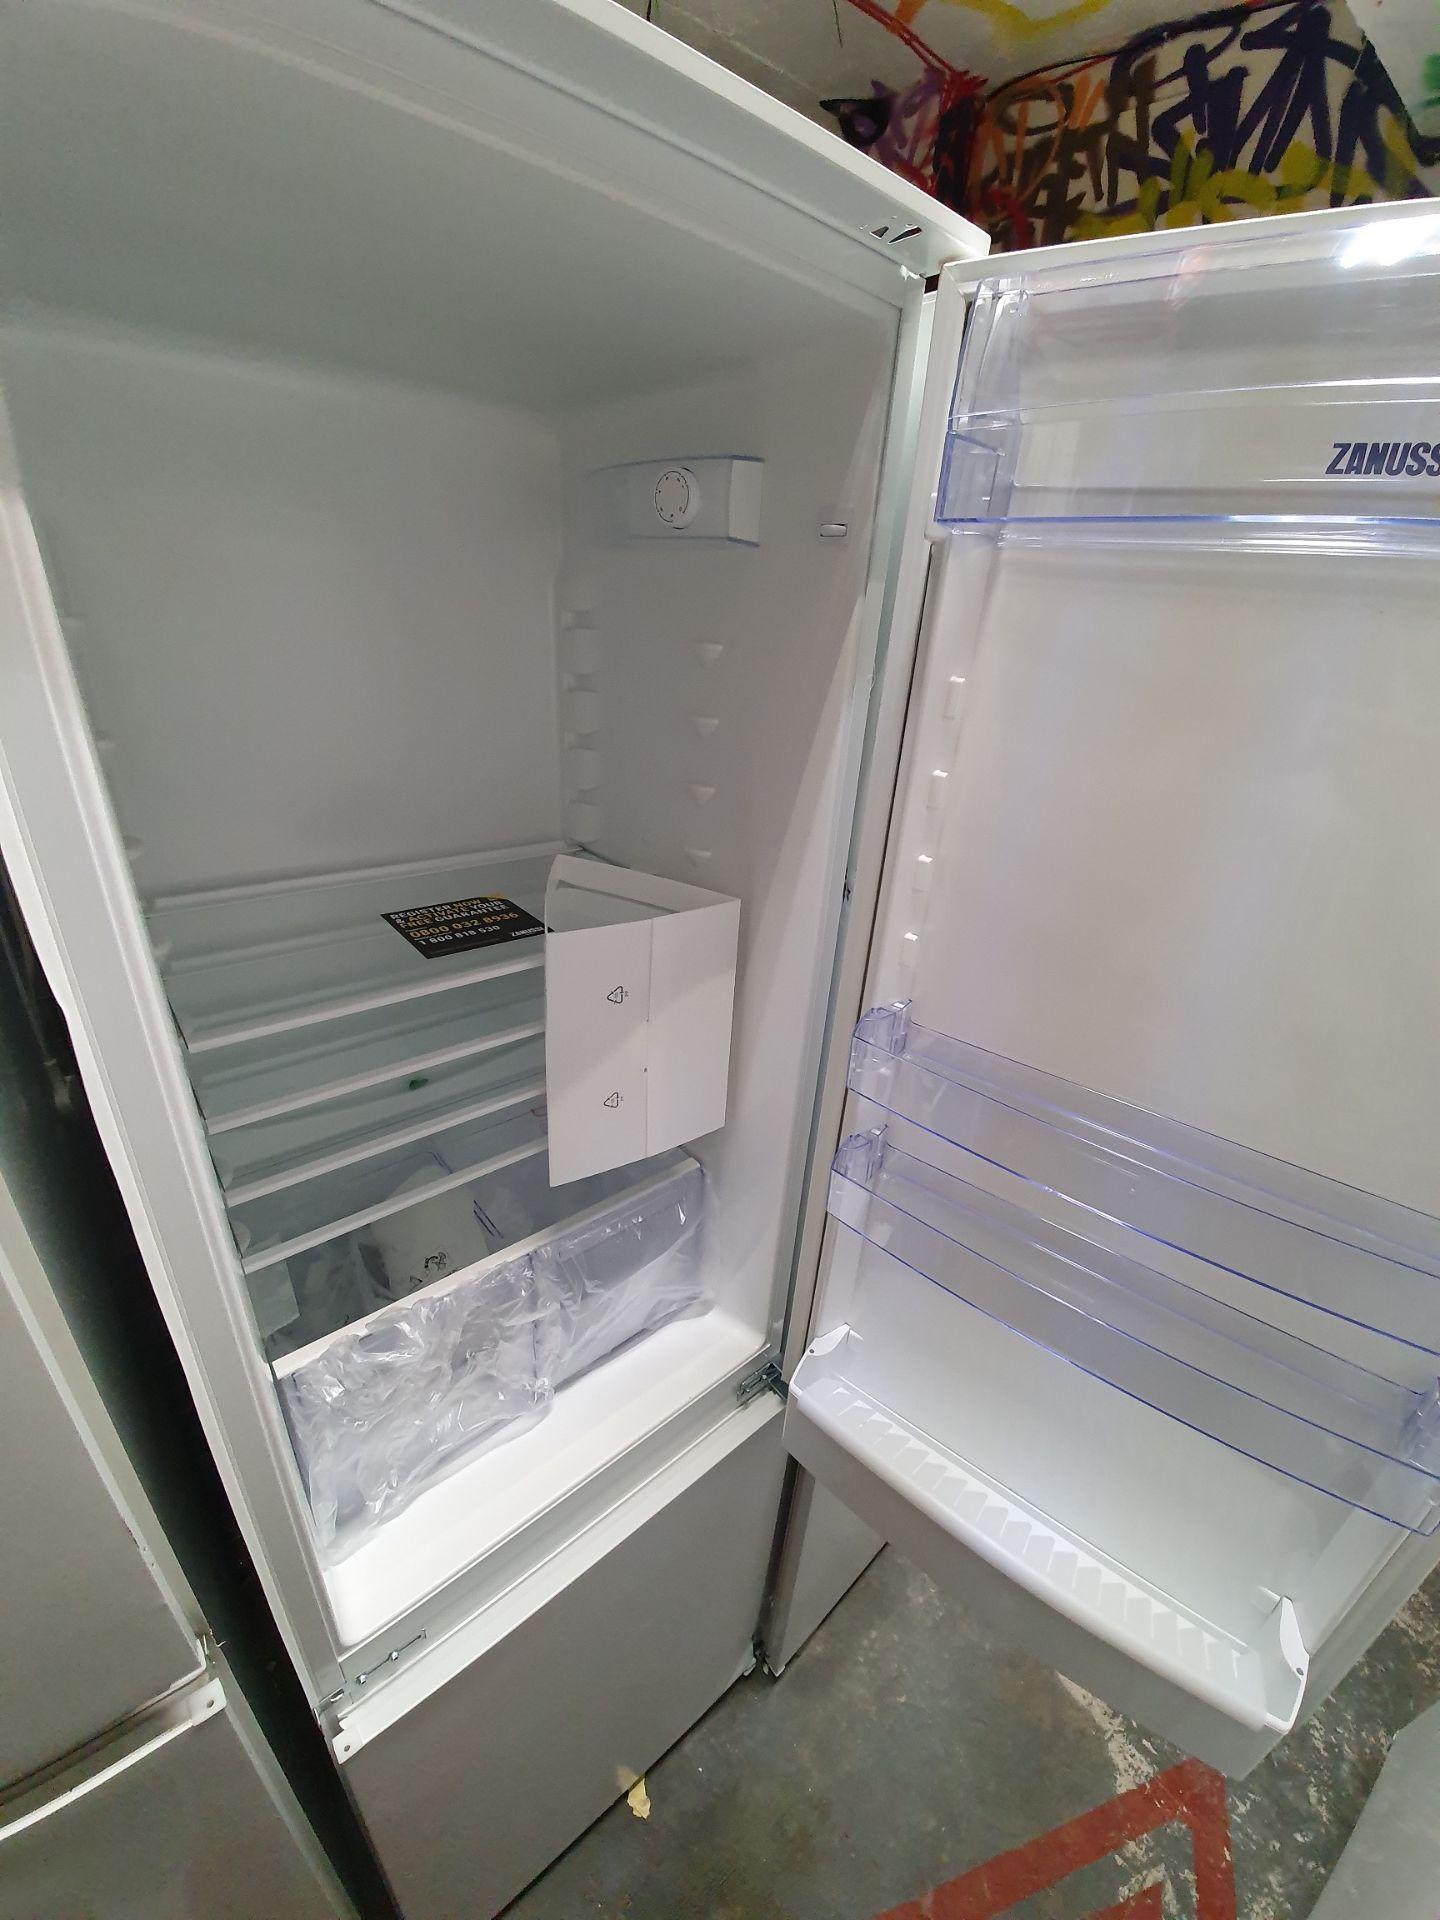 NEW/GRADED AND UNPACKAGED Zanussi ZBB27450SV Integrated 50/50 Fridge Freezer (Brand new slight - Image 9 of 14